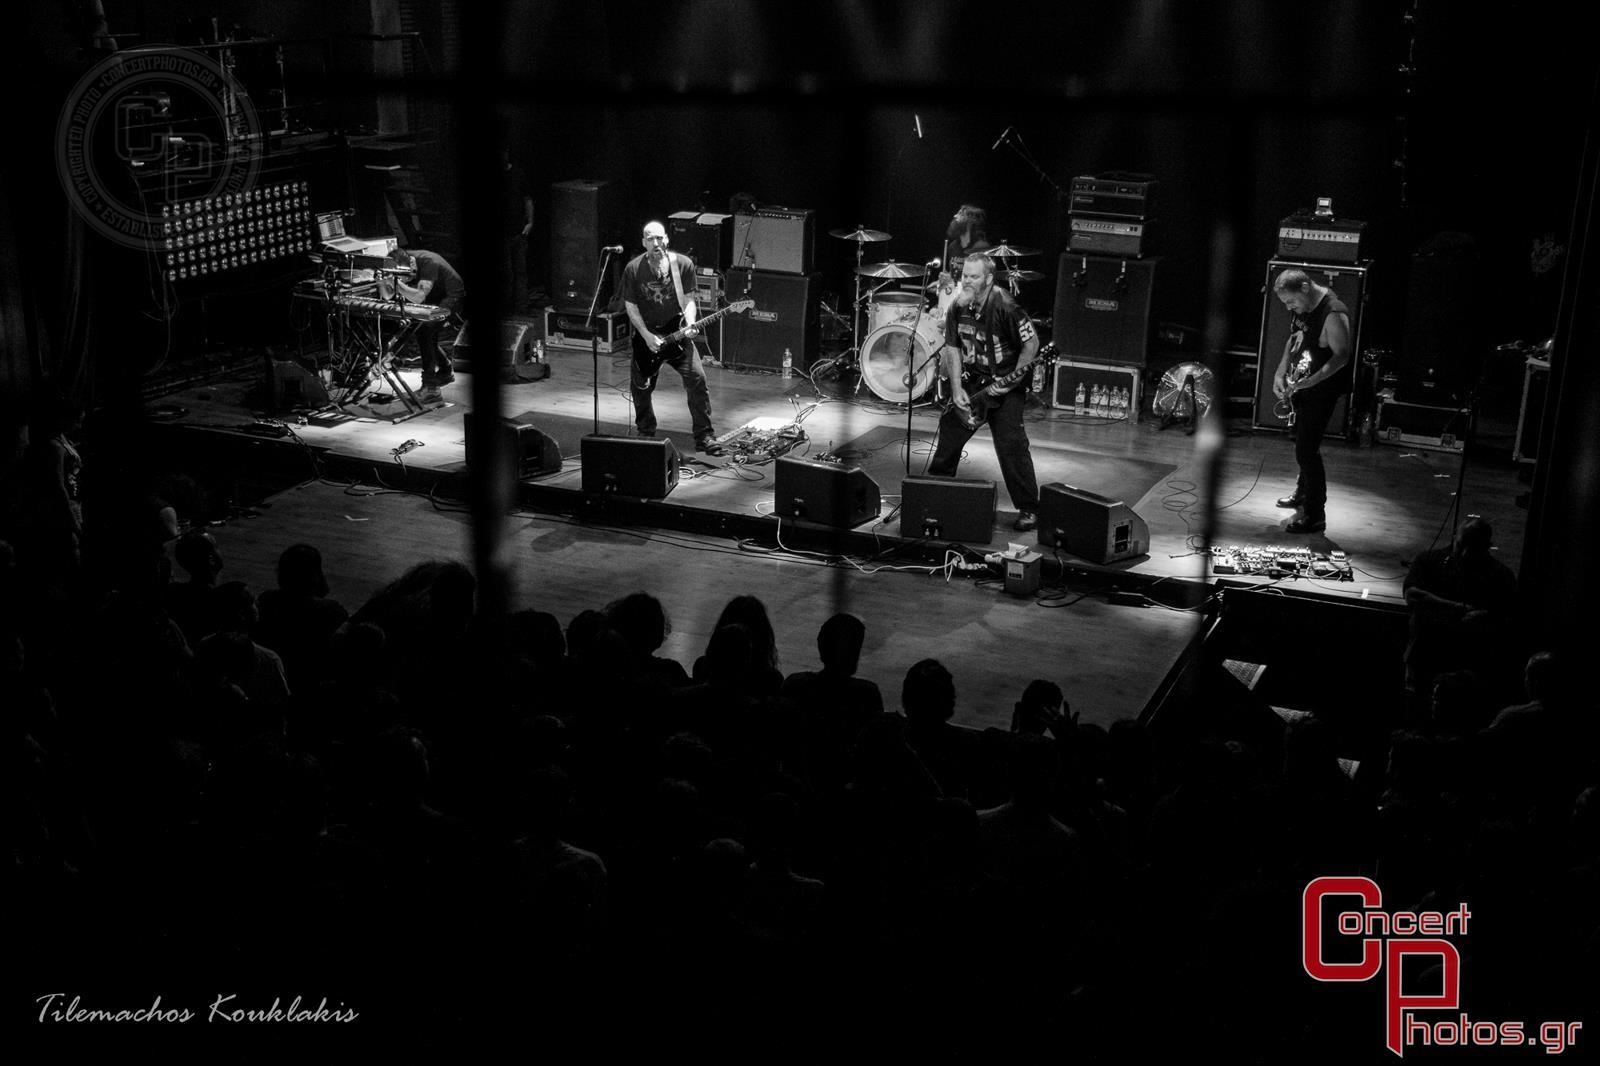 Neurosis-Neurosis photographer:  - concertphotos_20140707_23_56_37-3